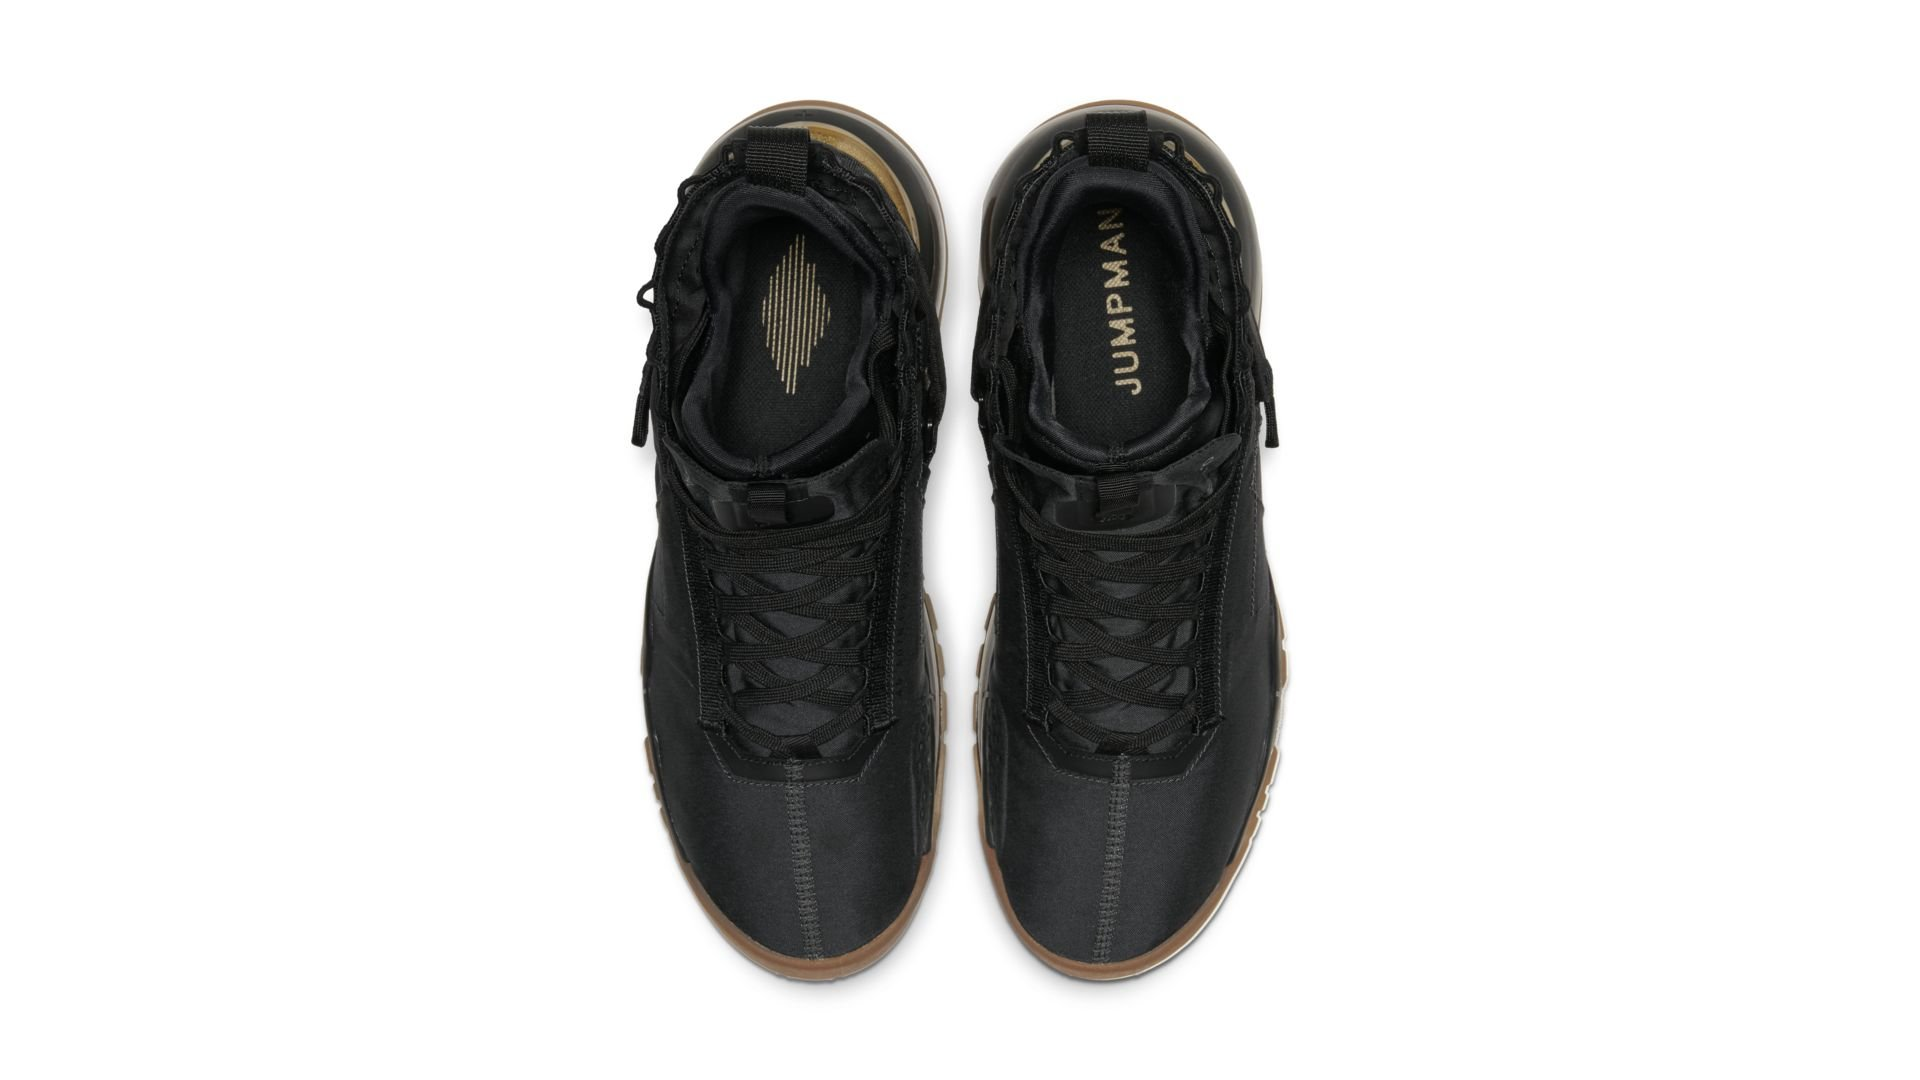 Jordan Proto Max 720 Black Gum (BQ6623-070)